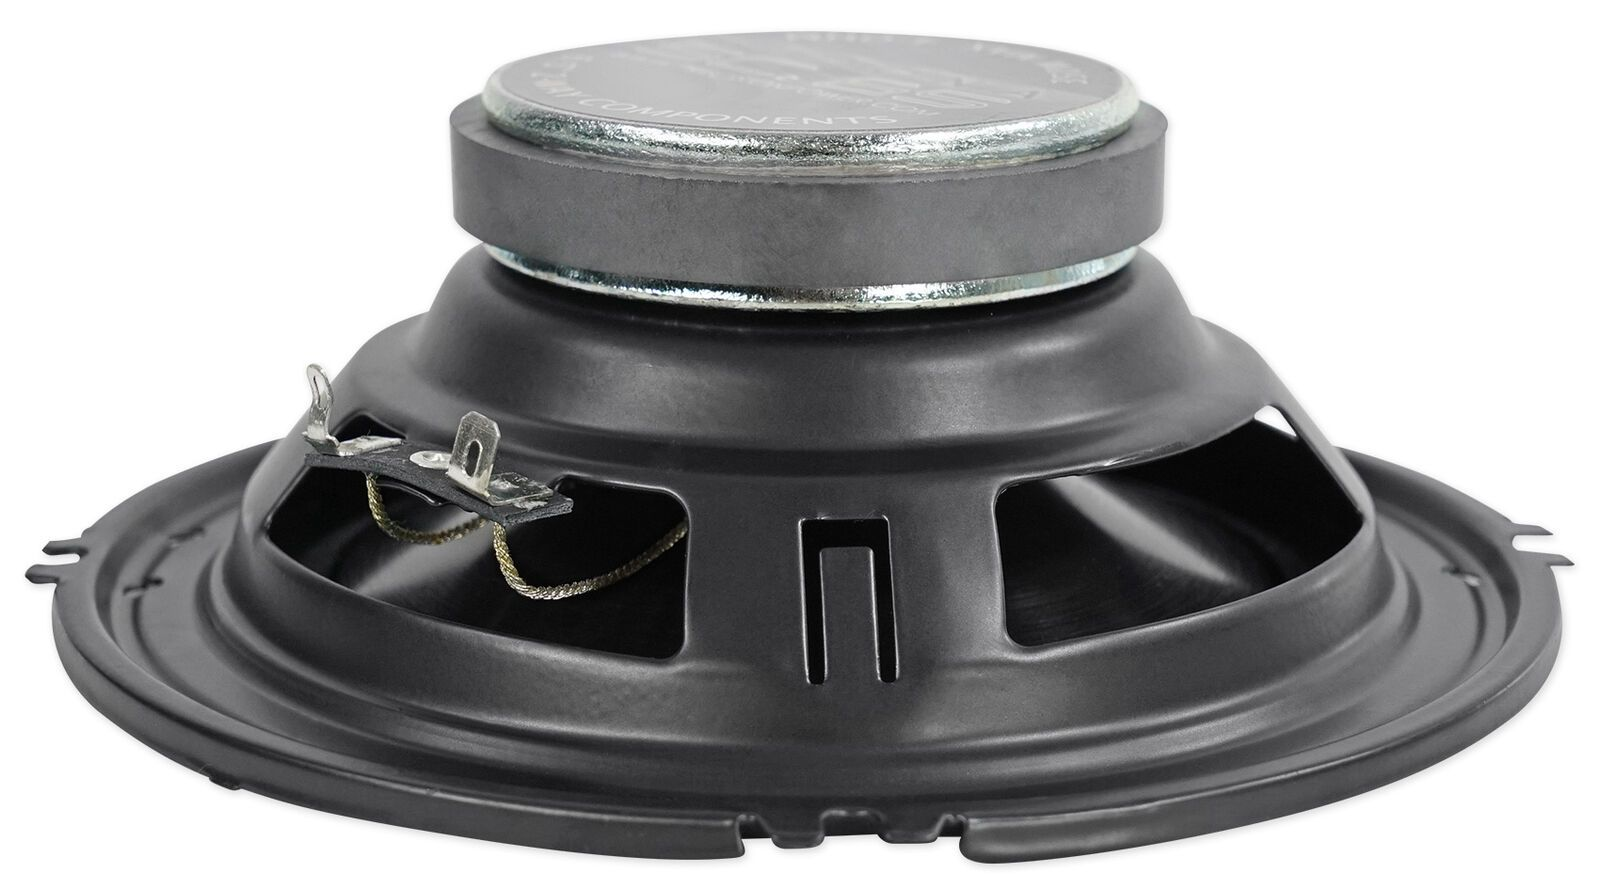 Pair Precision Power SC.65 6.5 350 Watt 2-Way Car Audio Component Speakers $32.95 End Date: 2019-09-15 14:21:55 Original price: $59.99 #componentspeakers